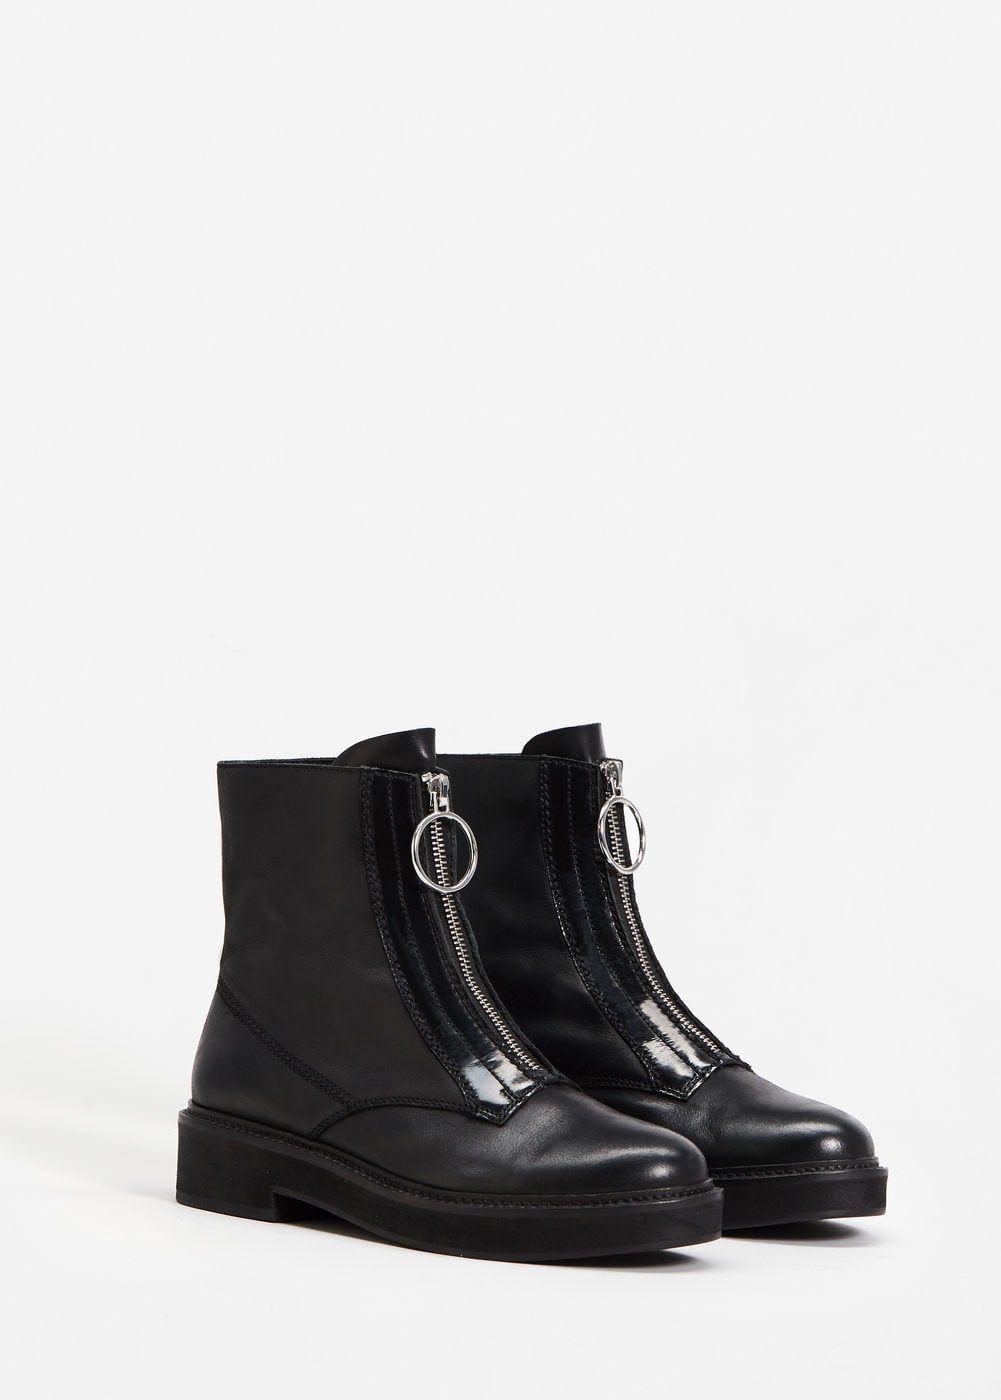 Zipper leather boots - Woman  f0a1d4b8de